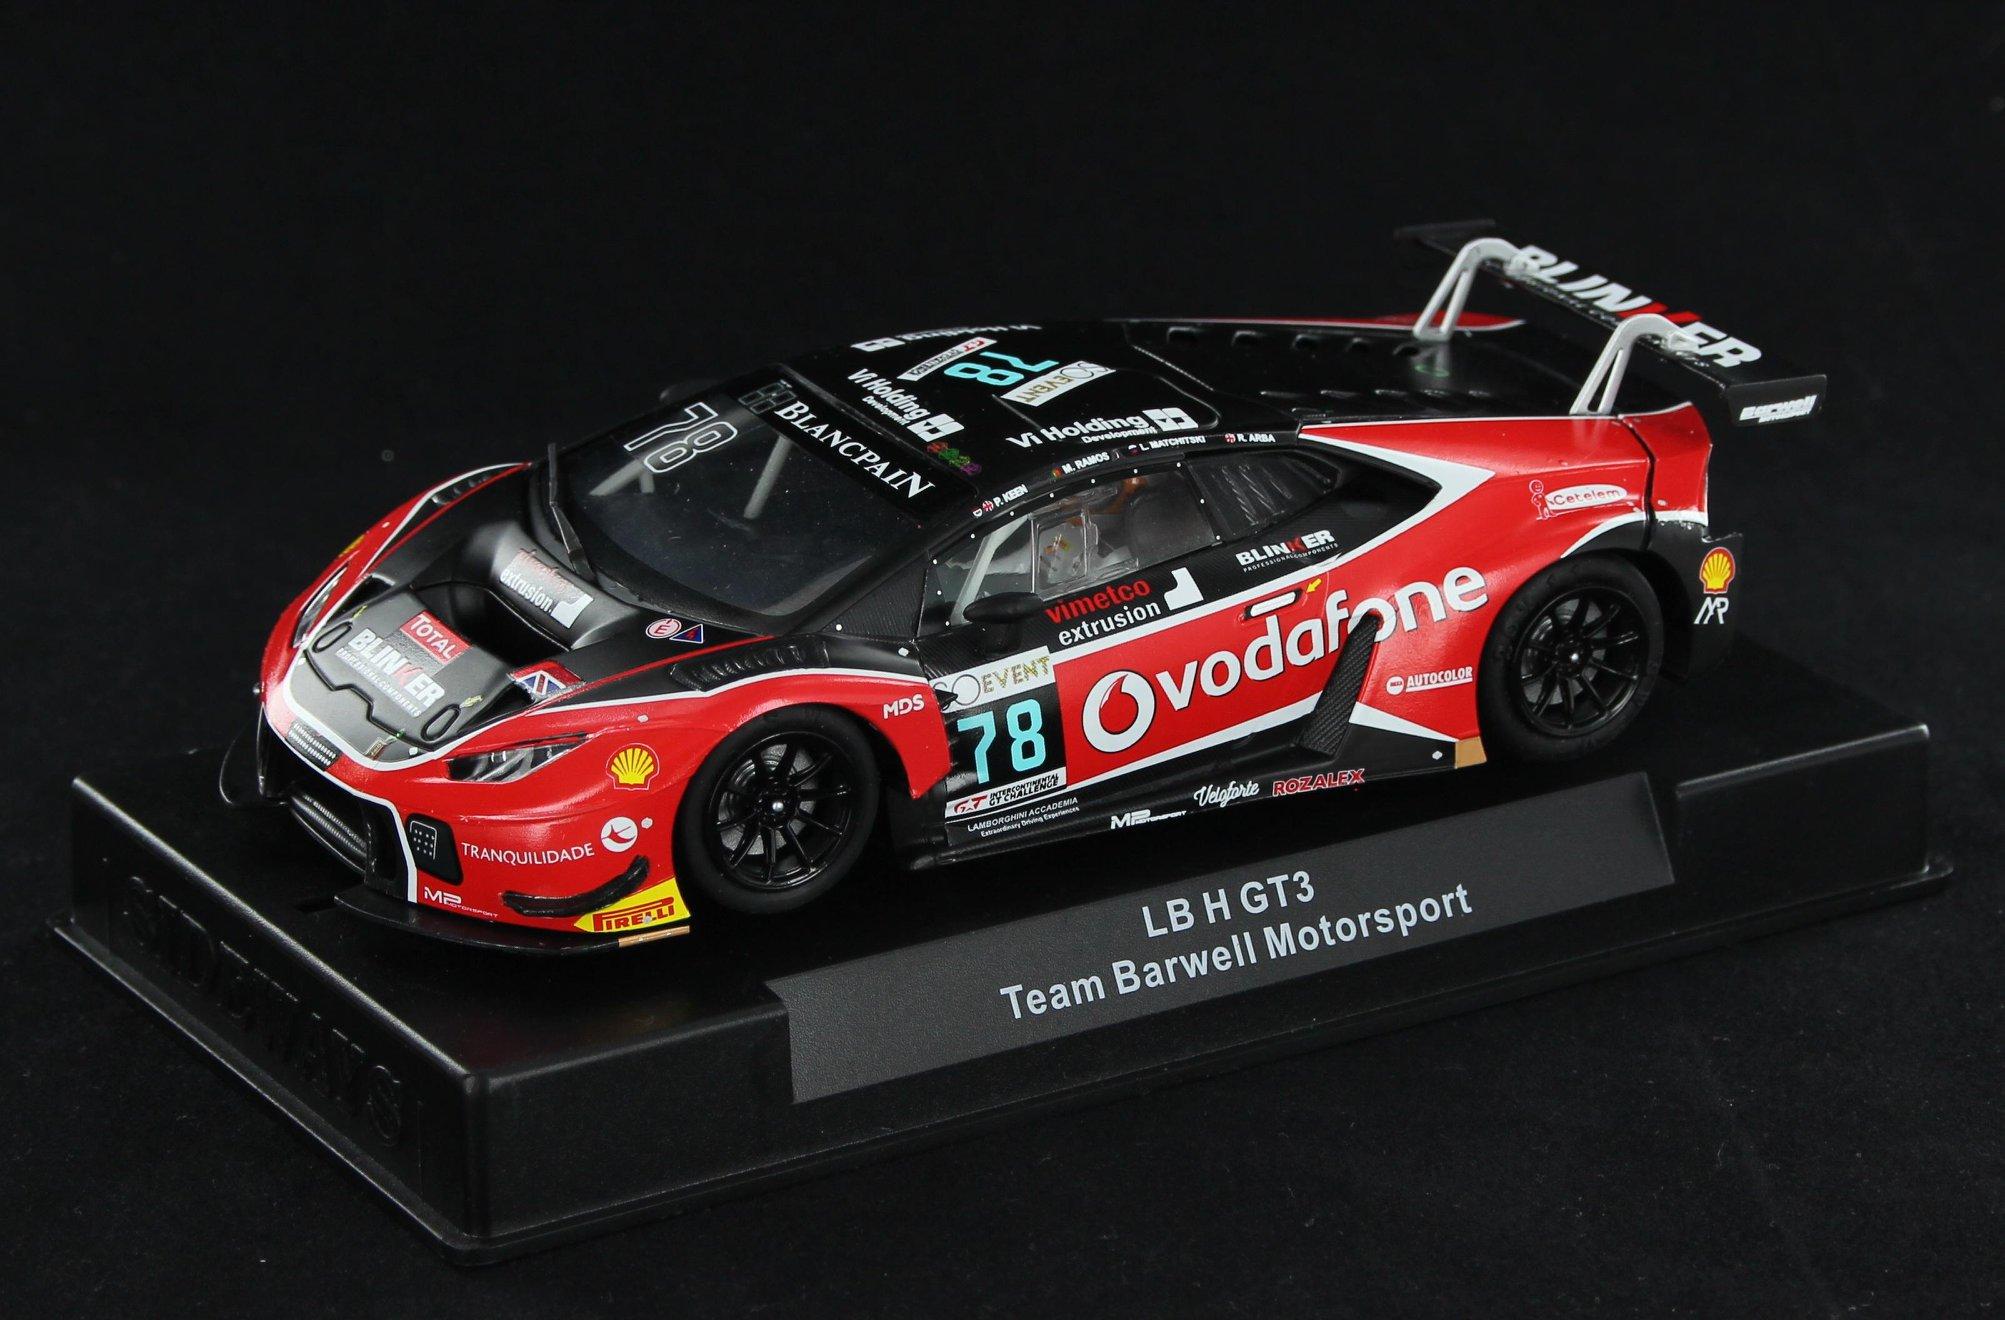 - SWCAR01E LB H Gt3 Team Barwell Motorsport